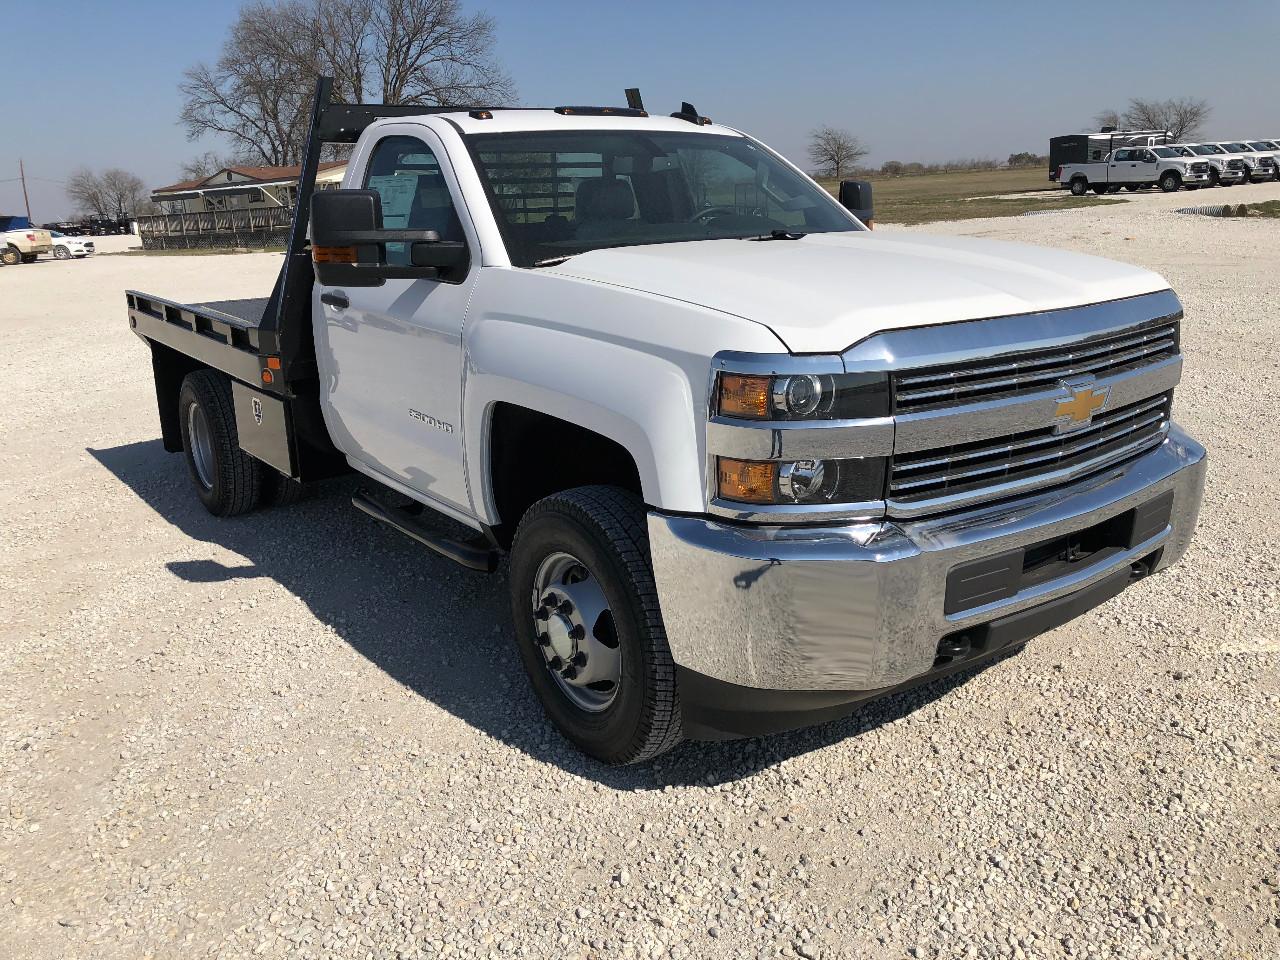 2018 chevrolet silverado 3500hd work truck whitesboro tx. Black Bedroom Furniture Sets. Home Design Ideas